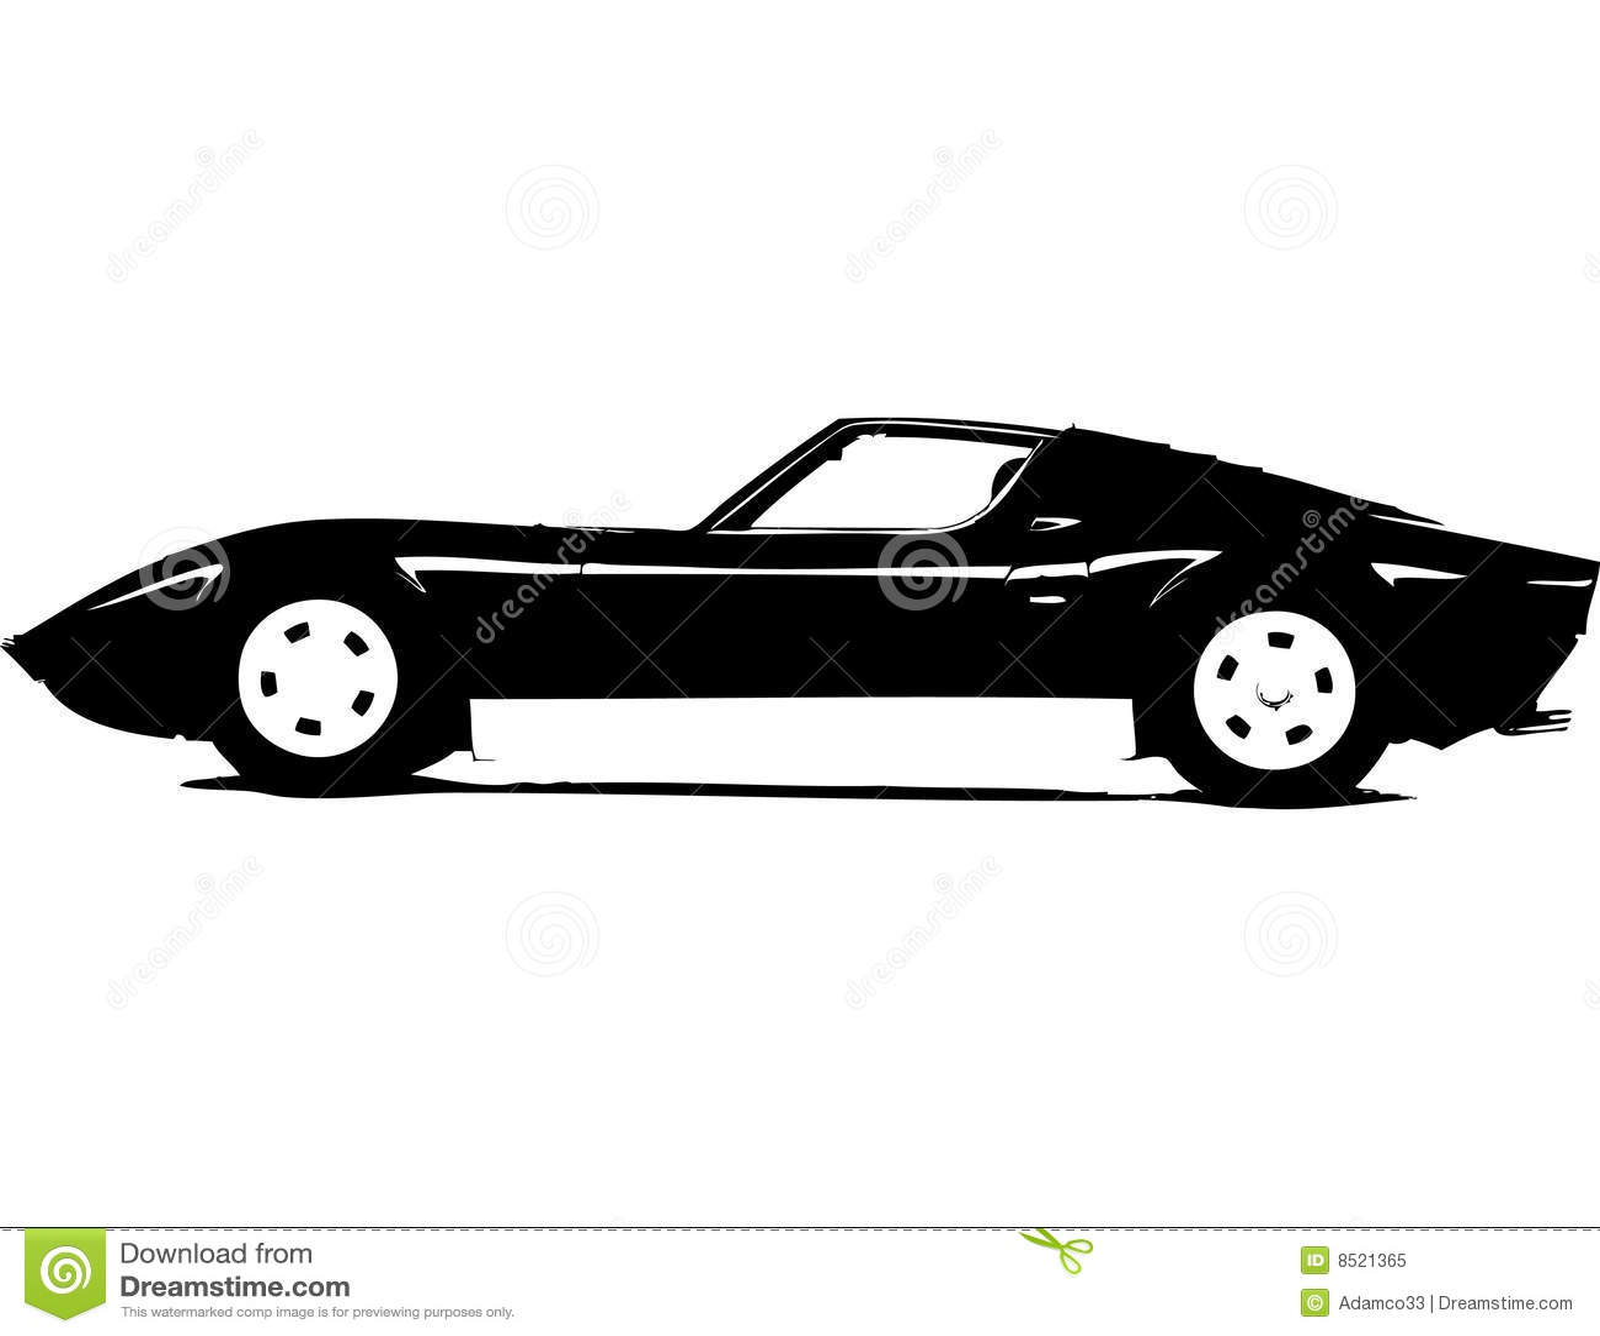 Classic Supersport Car Stock Vector Illustration Of Aerodynamics 8521365